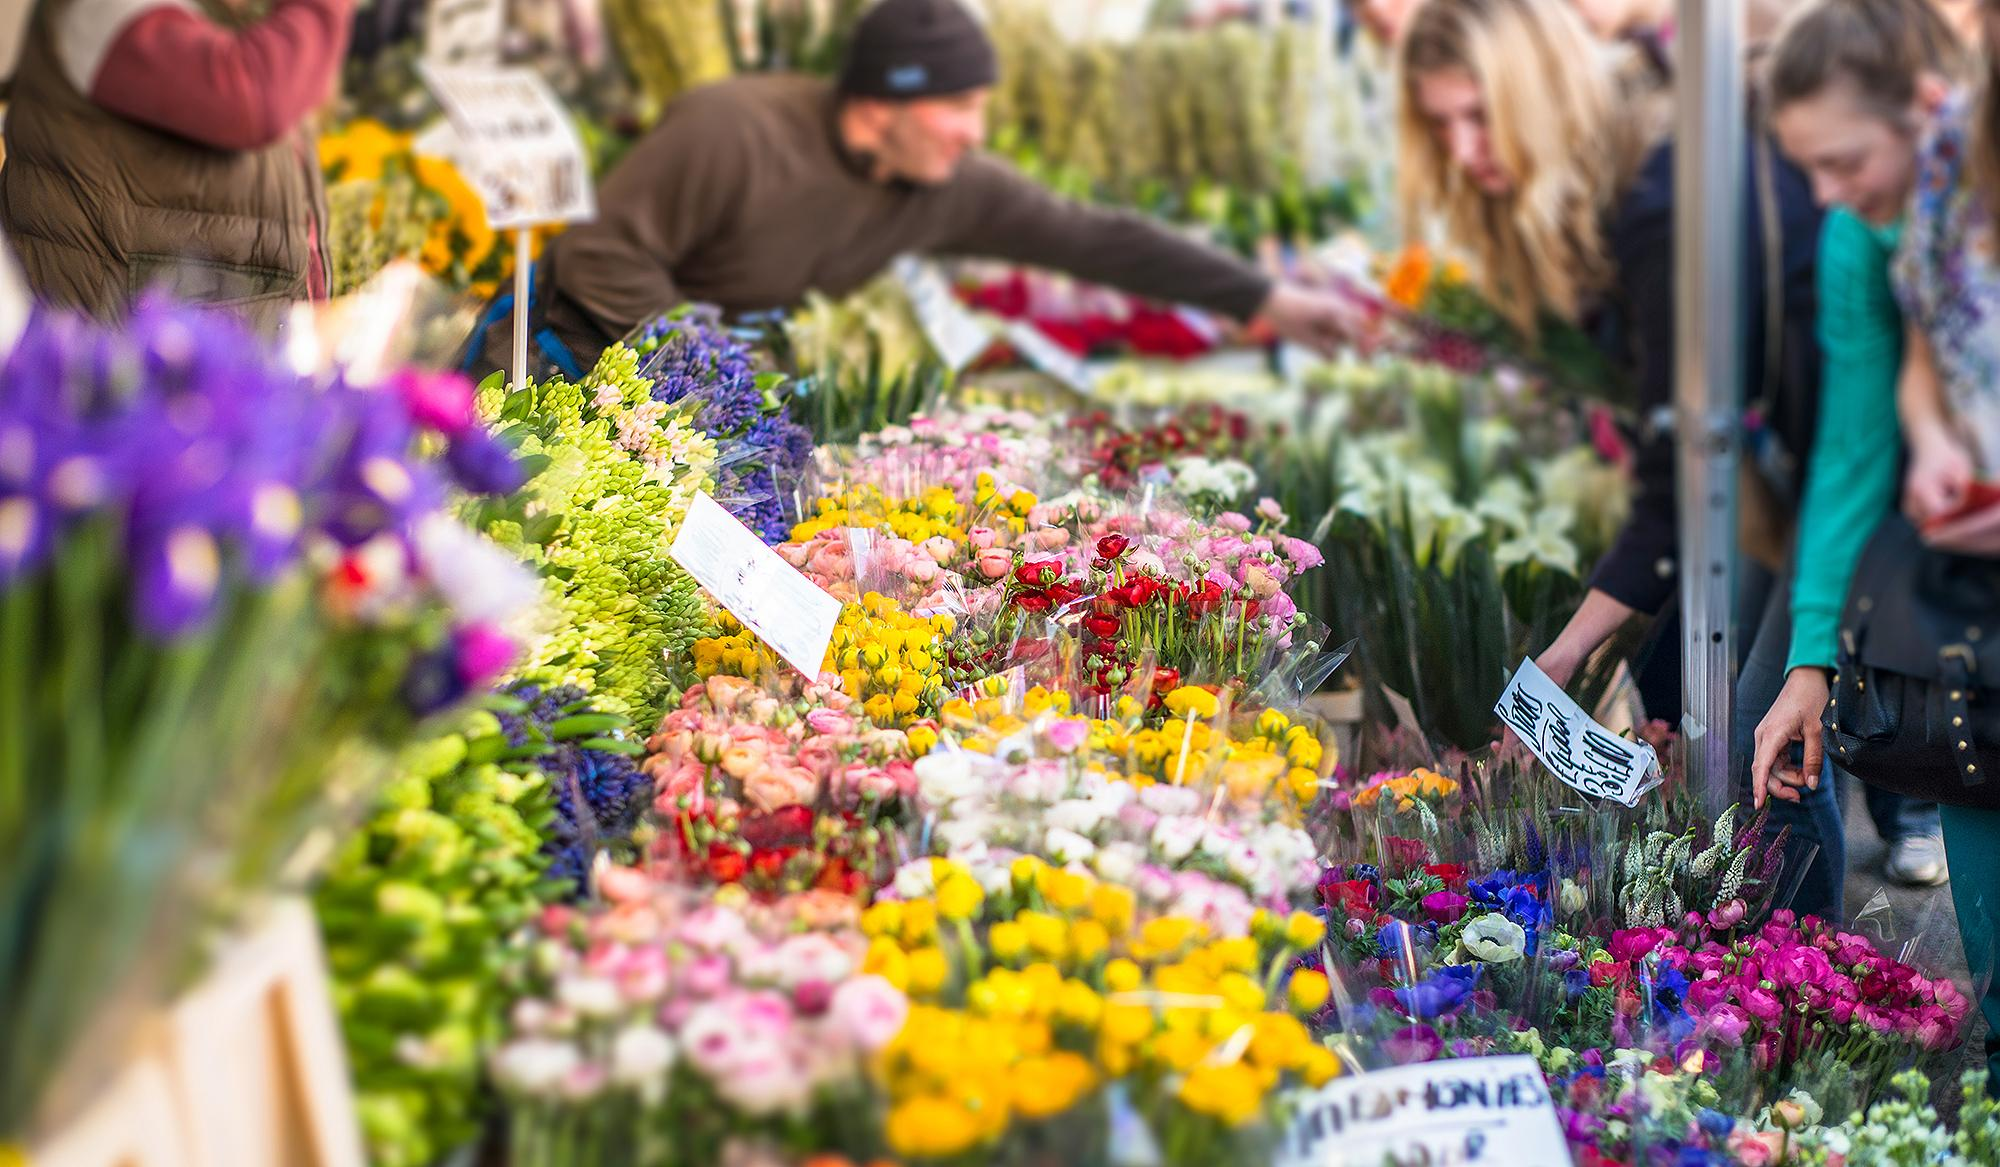 2000-columbia_road_flower_market_getty